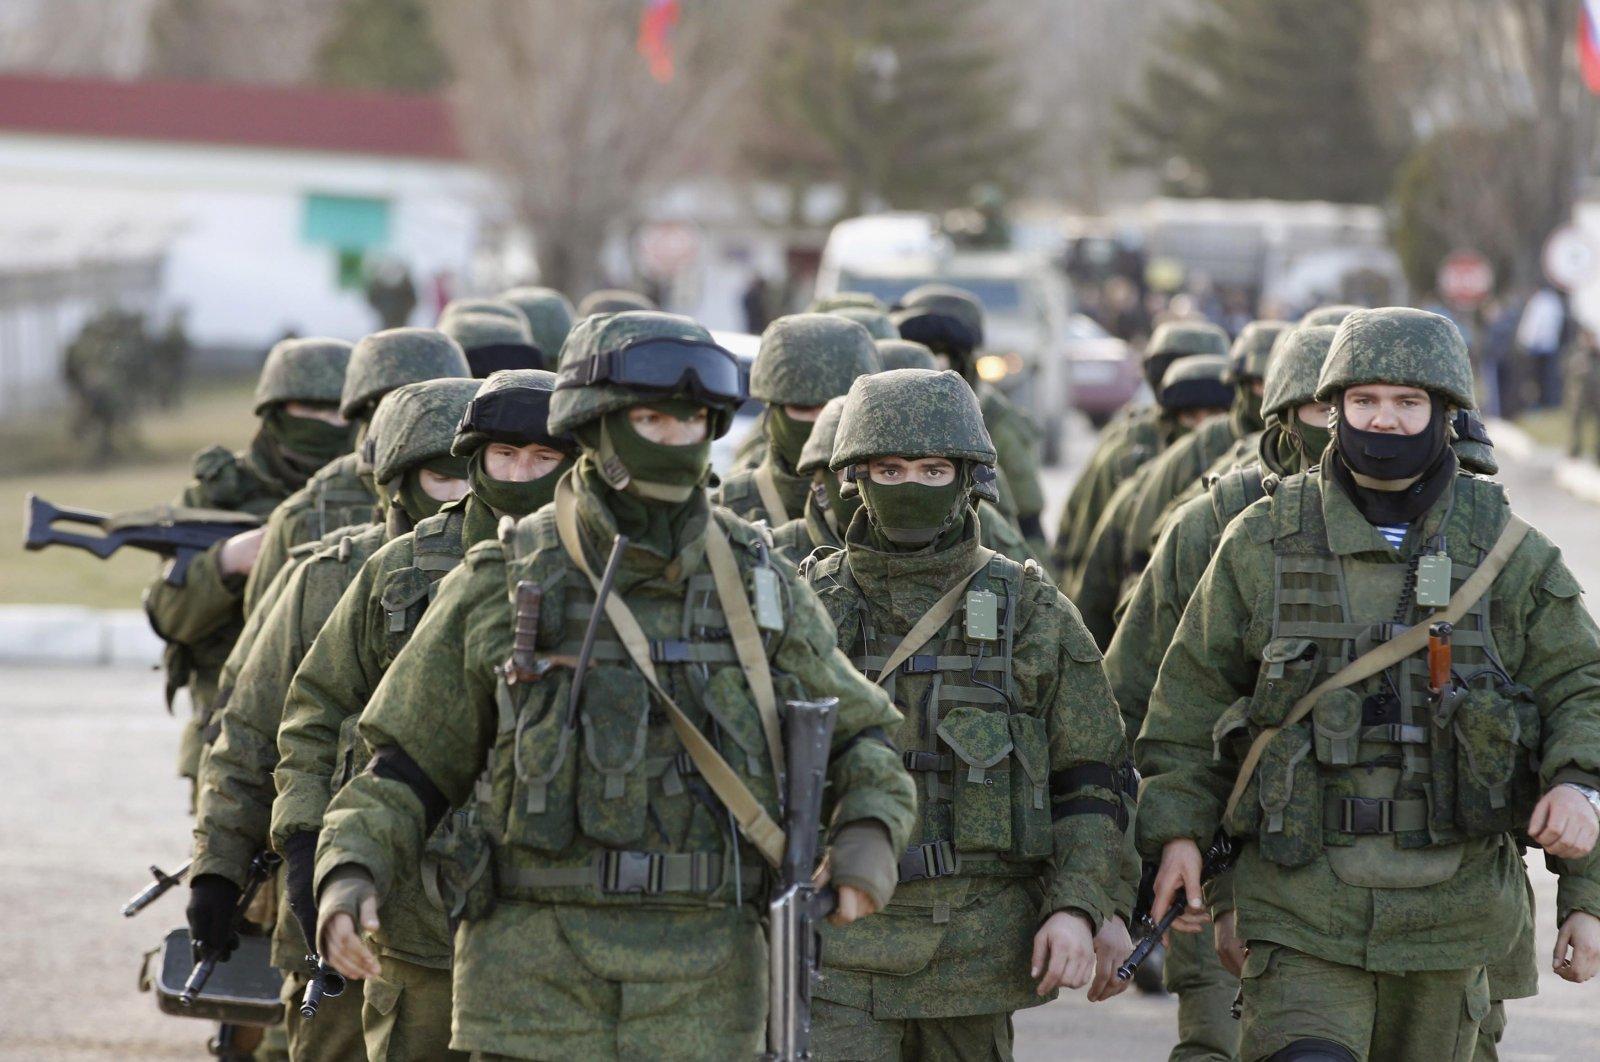 Russian servicemen walk outside the territory of a Ukrainian military unit in the village of Perevalnoye outside Simferopol in Russian-occupied Crimea, Ukraine, March 3, 2014. (Reuters Photo)